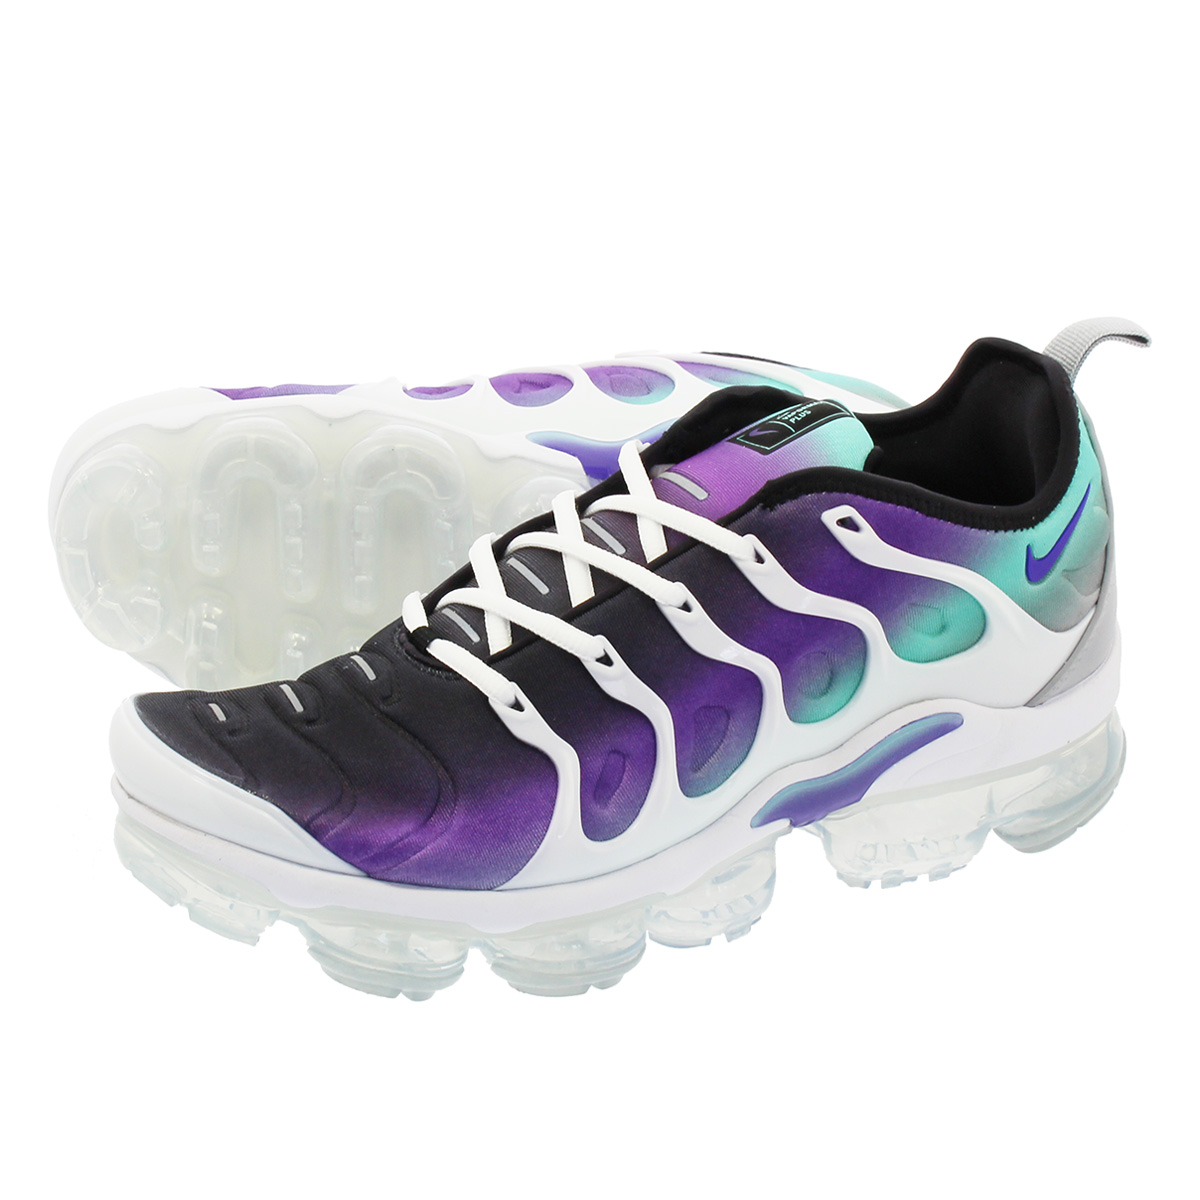 f4bb776073 LOWTEX PLUS: NIKE AIR VAPORMAX PLUS Nike vapor max plus WHITE/FIERCE PURPLE  924,453-101 | Rakuten Global Market